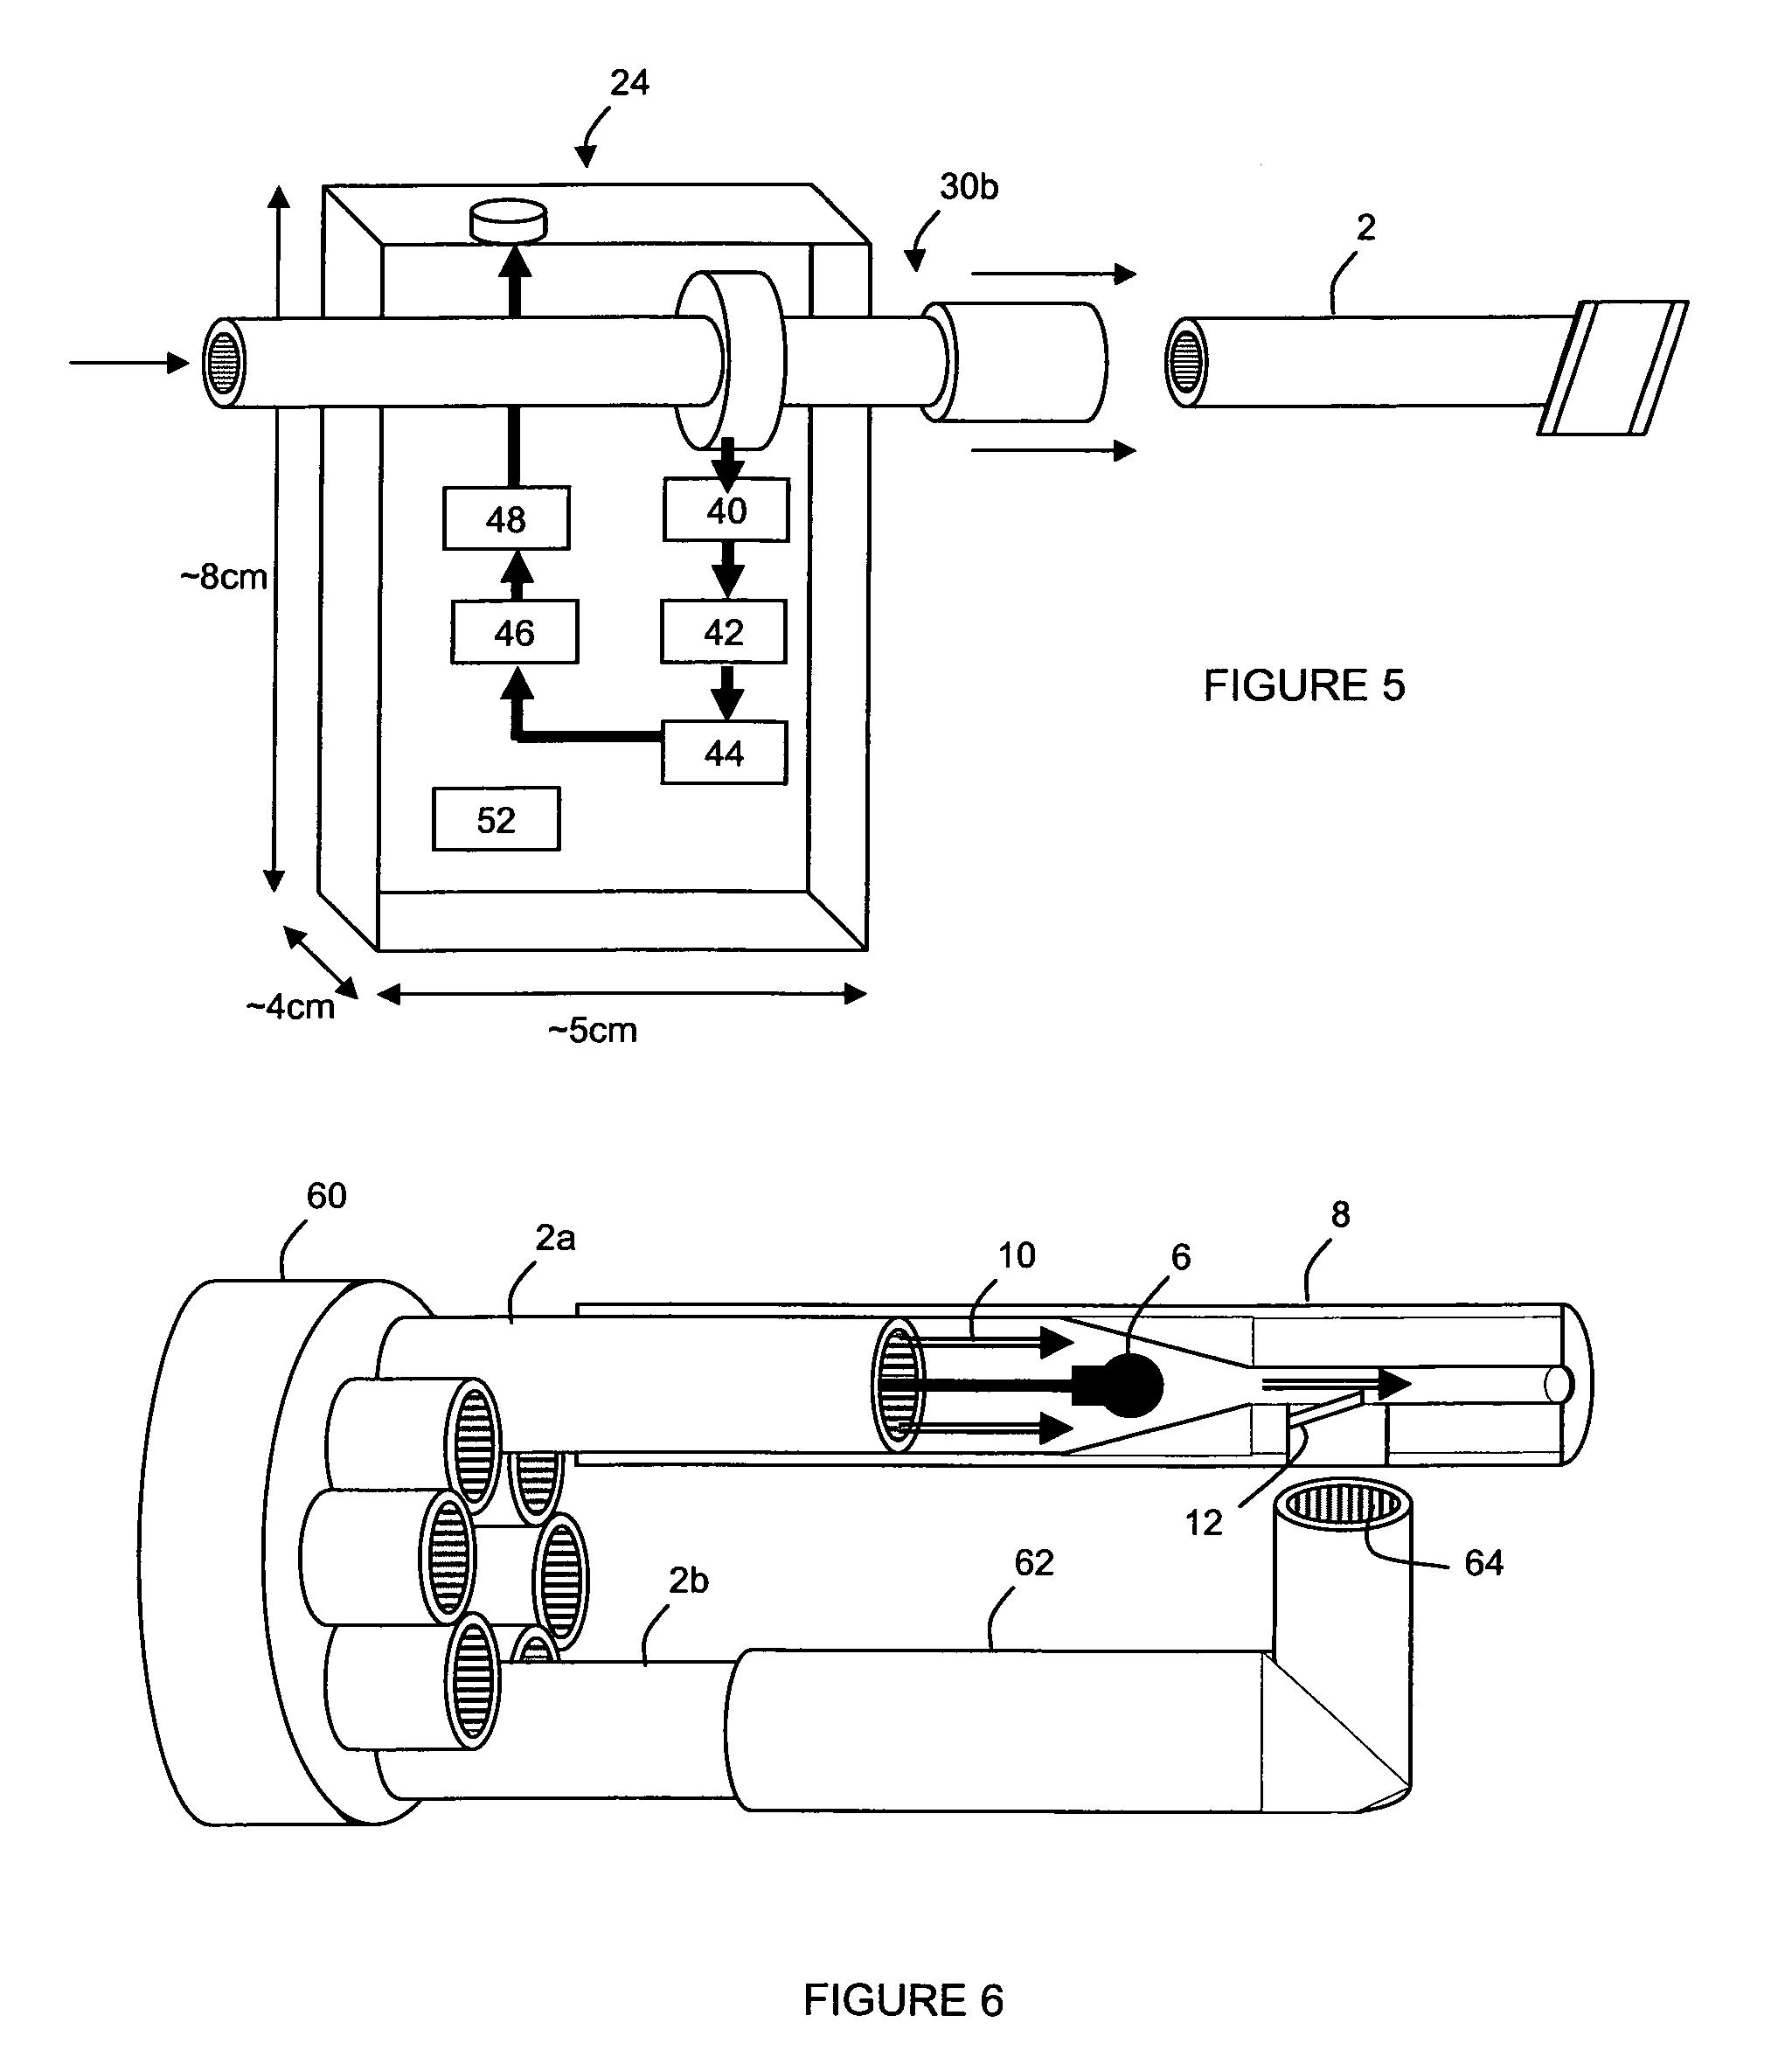 Duct Detector Wiring Diagram